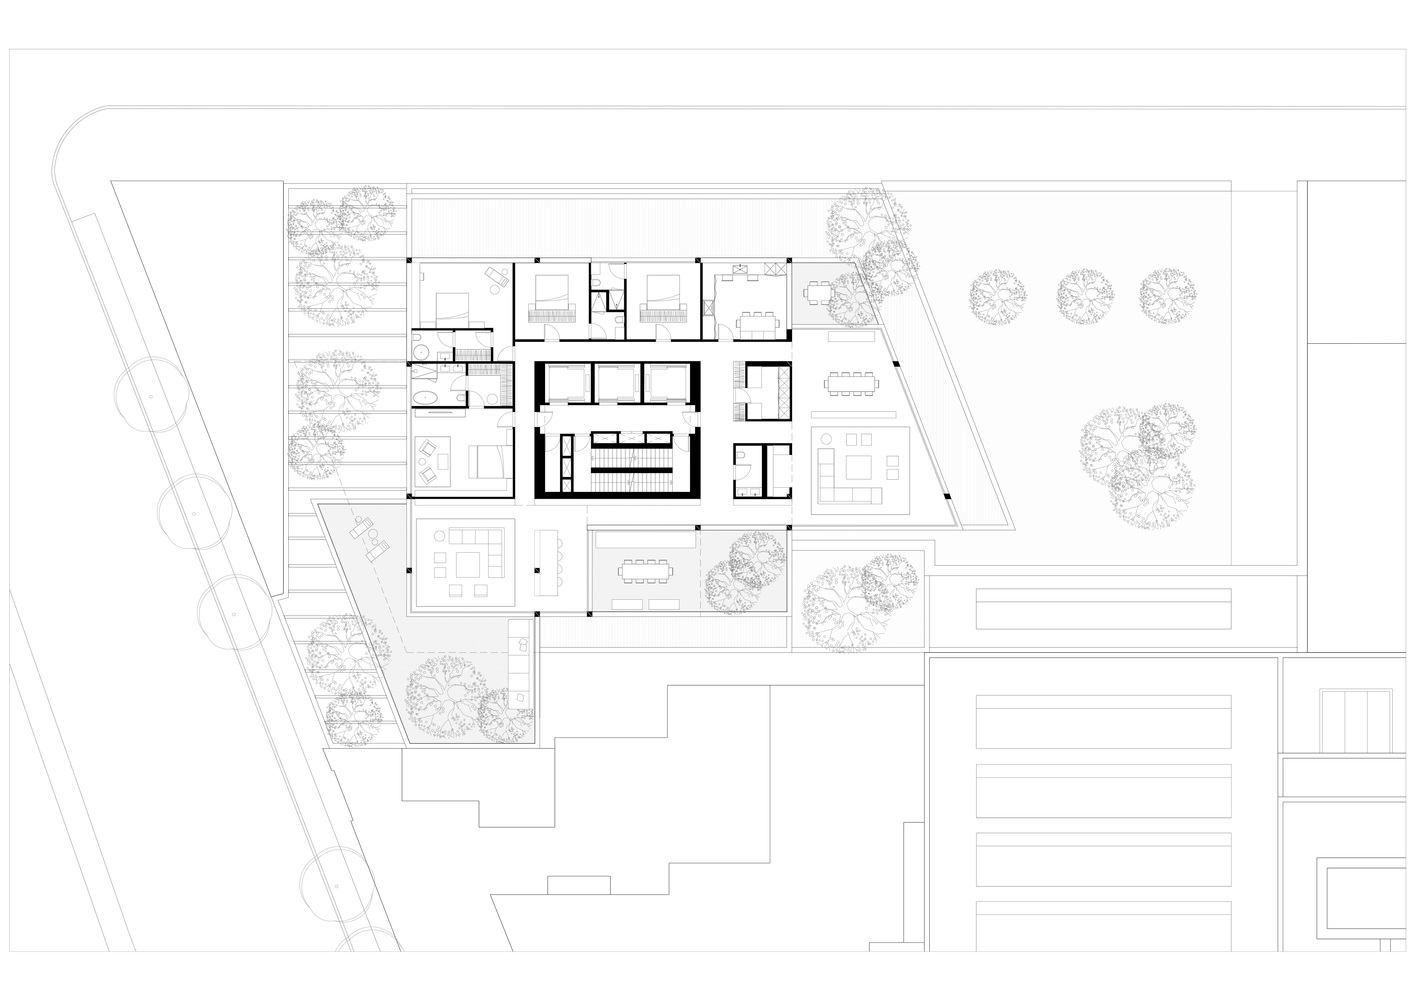 Artist studio plans free cool apartment floor plan best for Affordable furniture 5700 south loop east